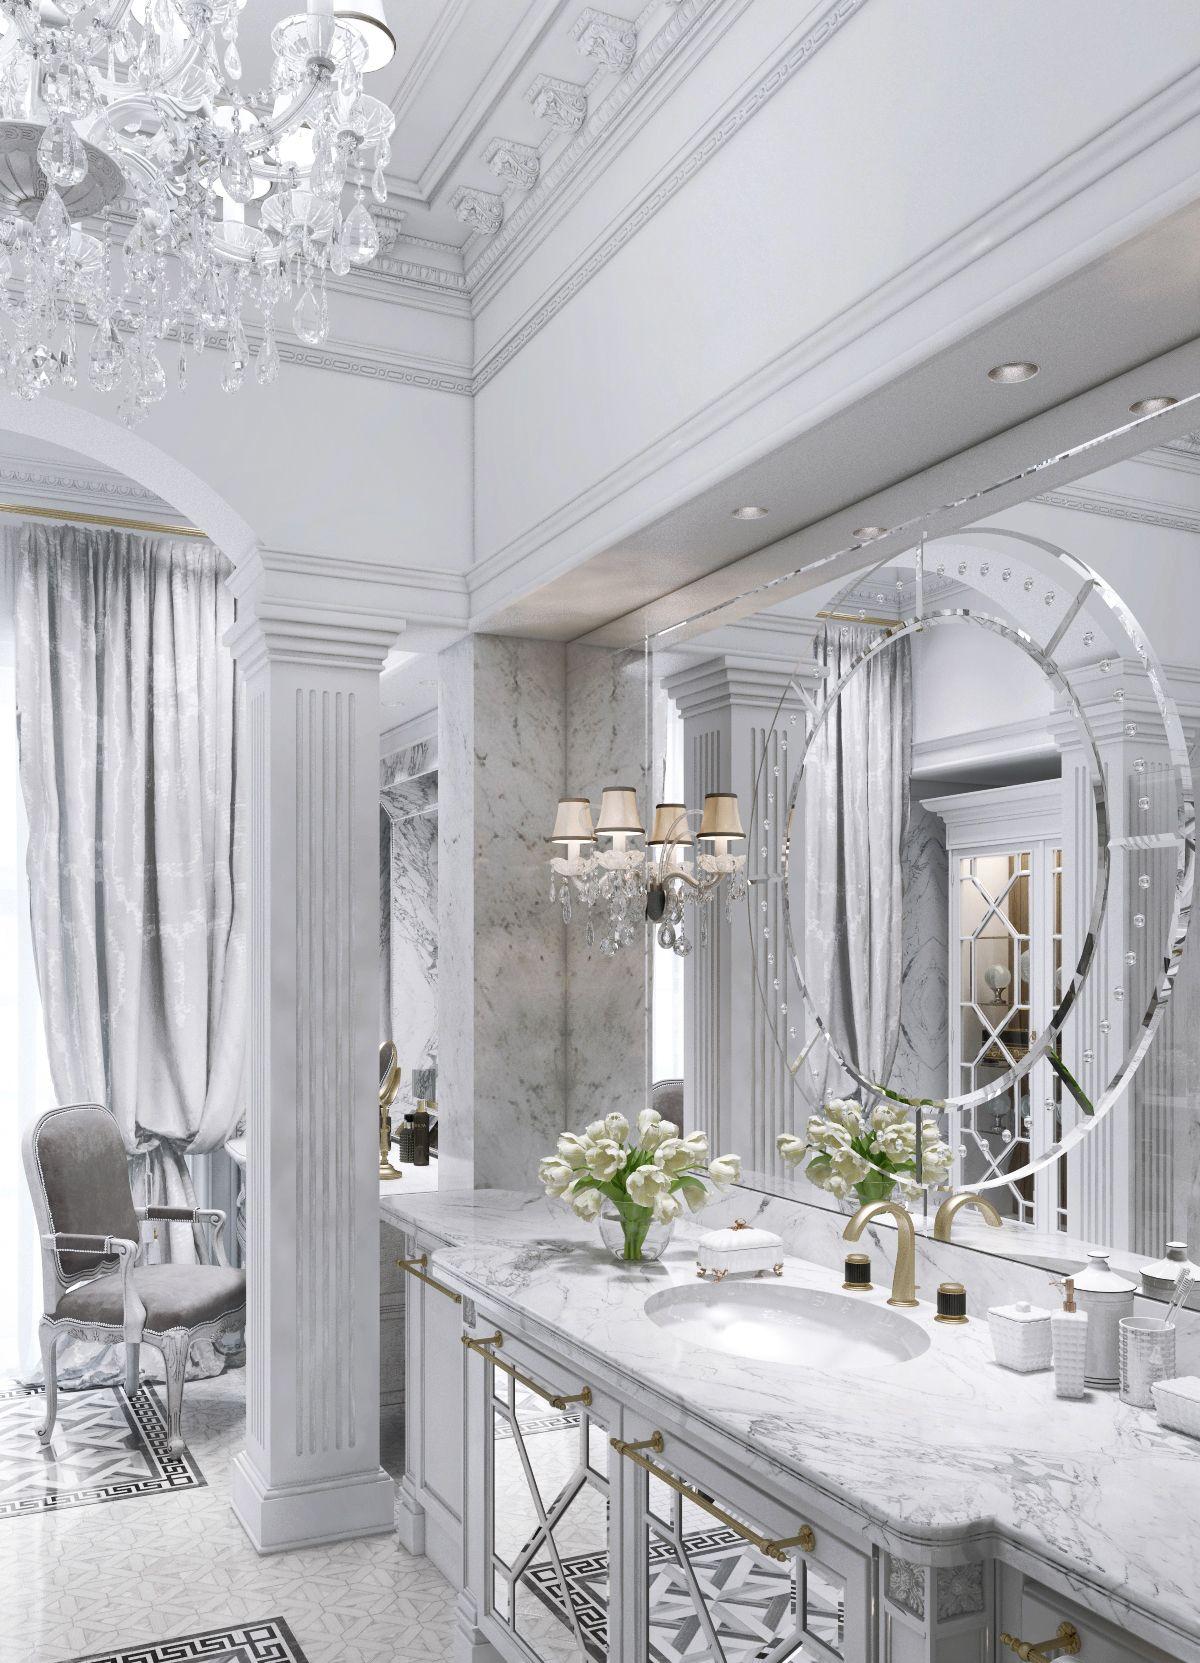 60 Elegant Small Master Bathroom Remodel Ideas 15 Beautiful Bathroom Decor Bathroom Remodel Master Small Master Bathroom